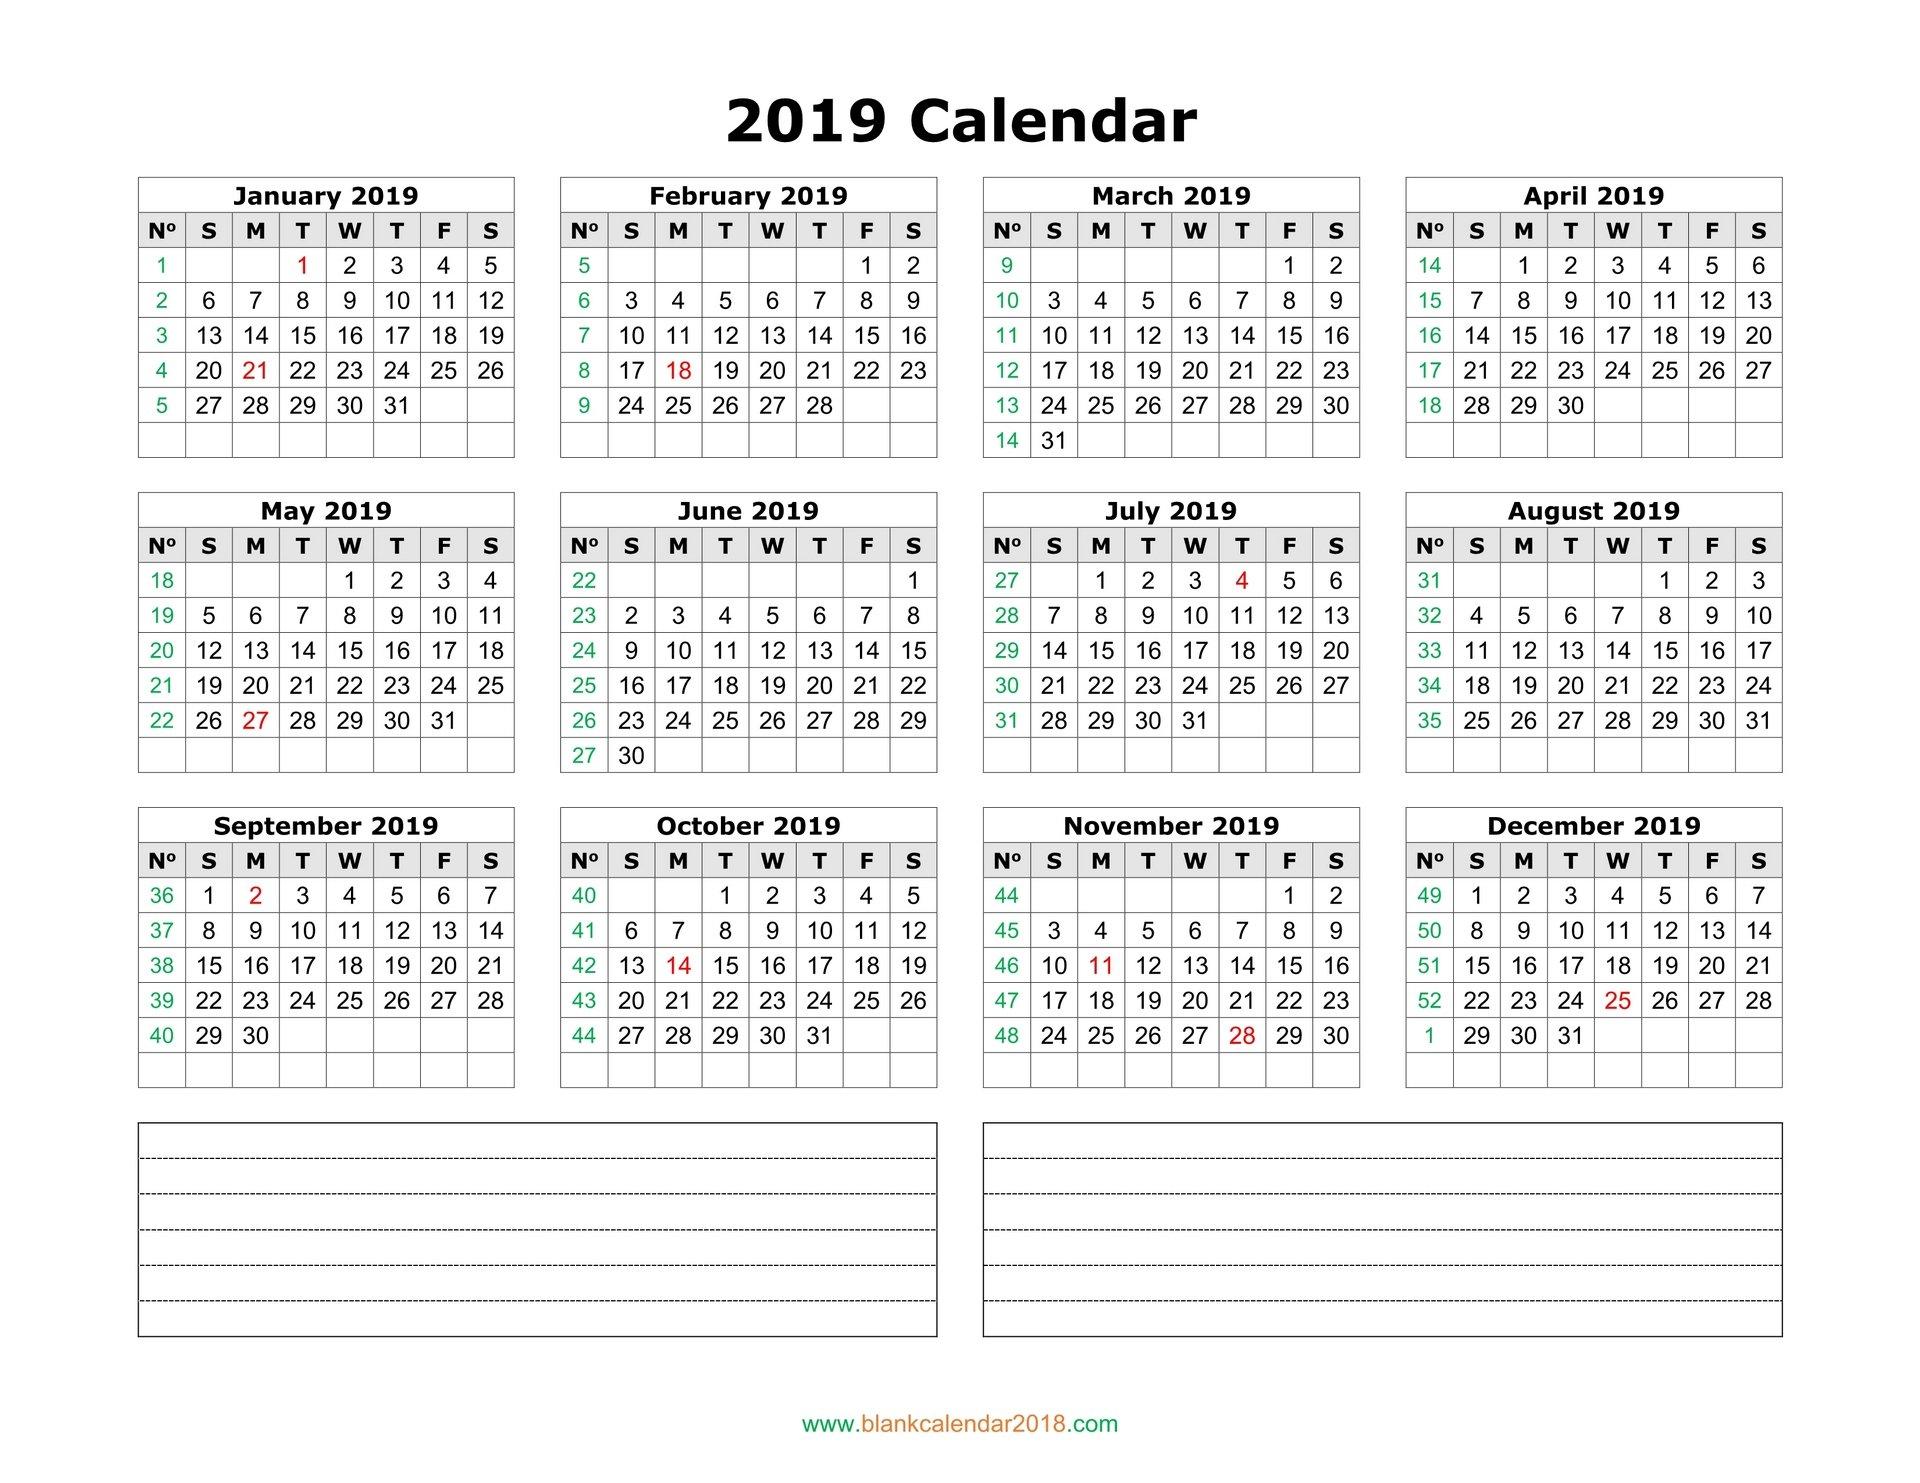 Blank Calendar 2019 Calendar 2019 Landscape